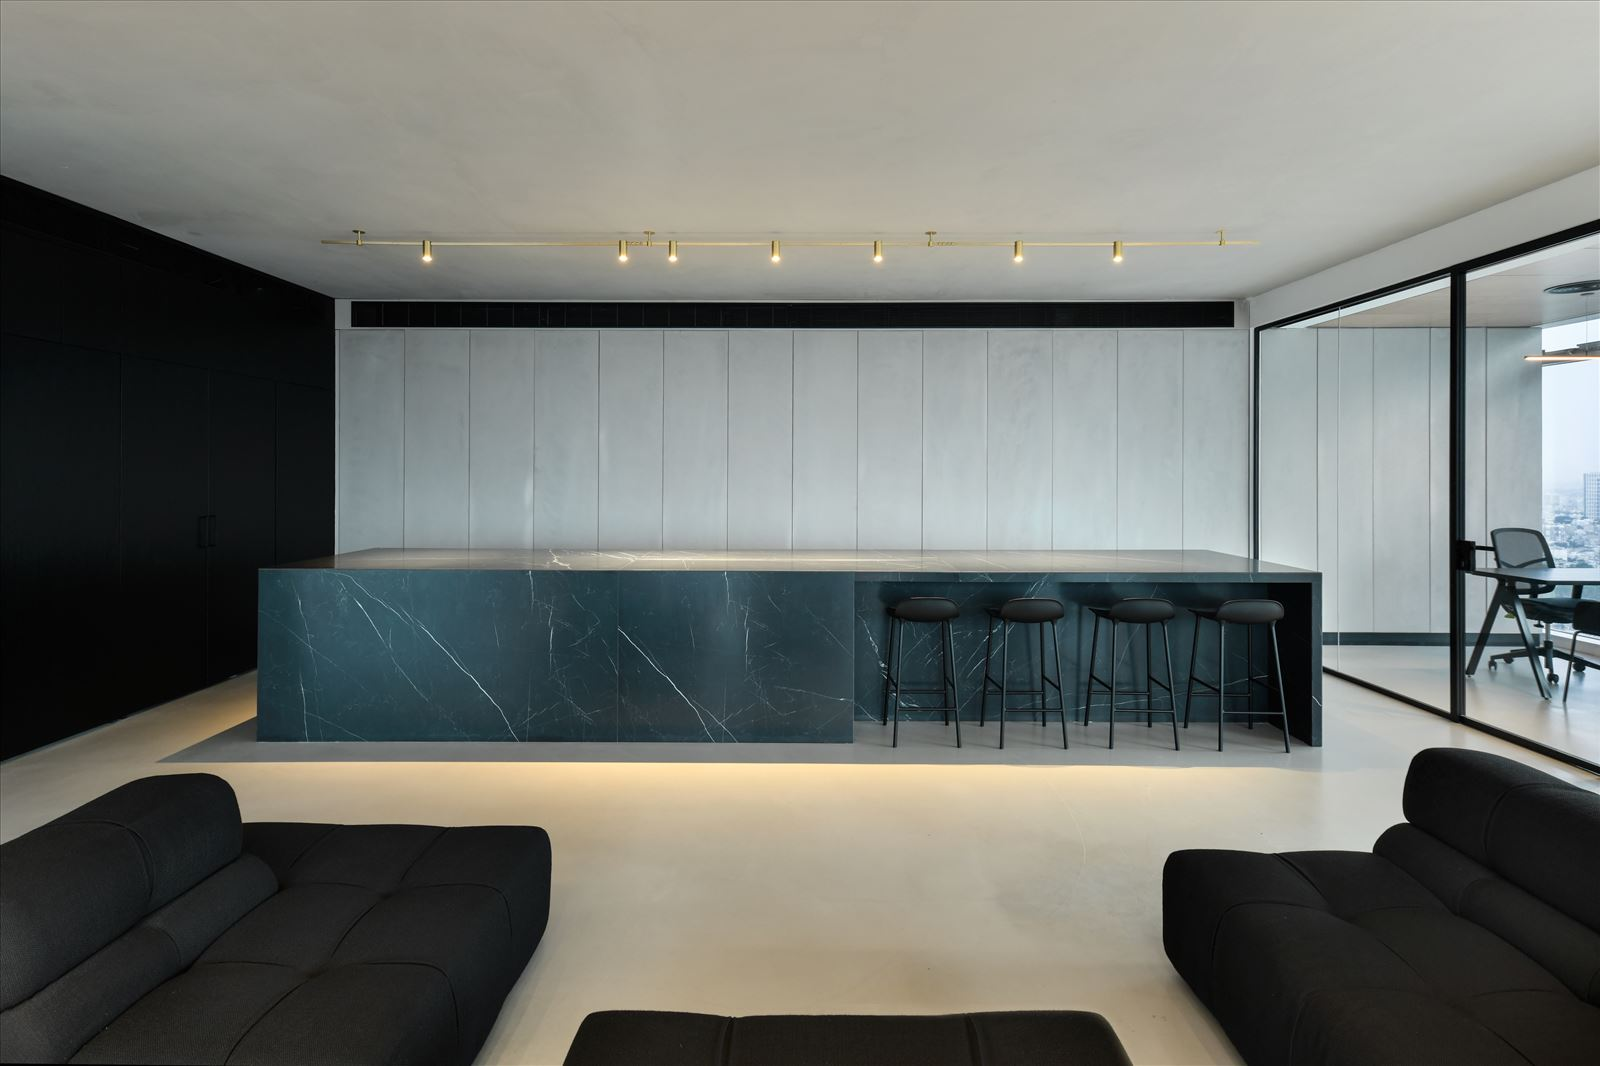 Divident office גוף תאורה ארוך מעל כל הבר בעיצובו של קמחי תאורה